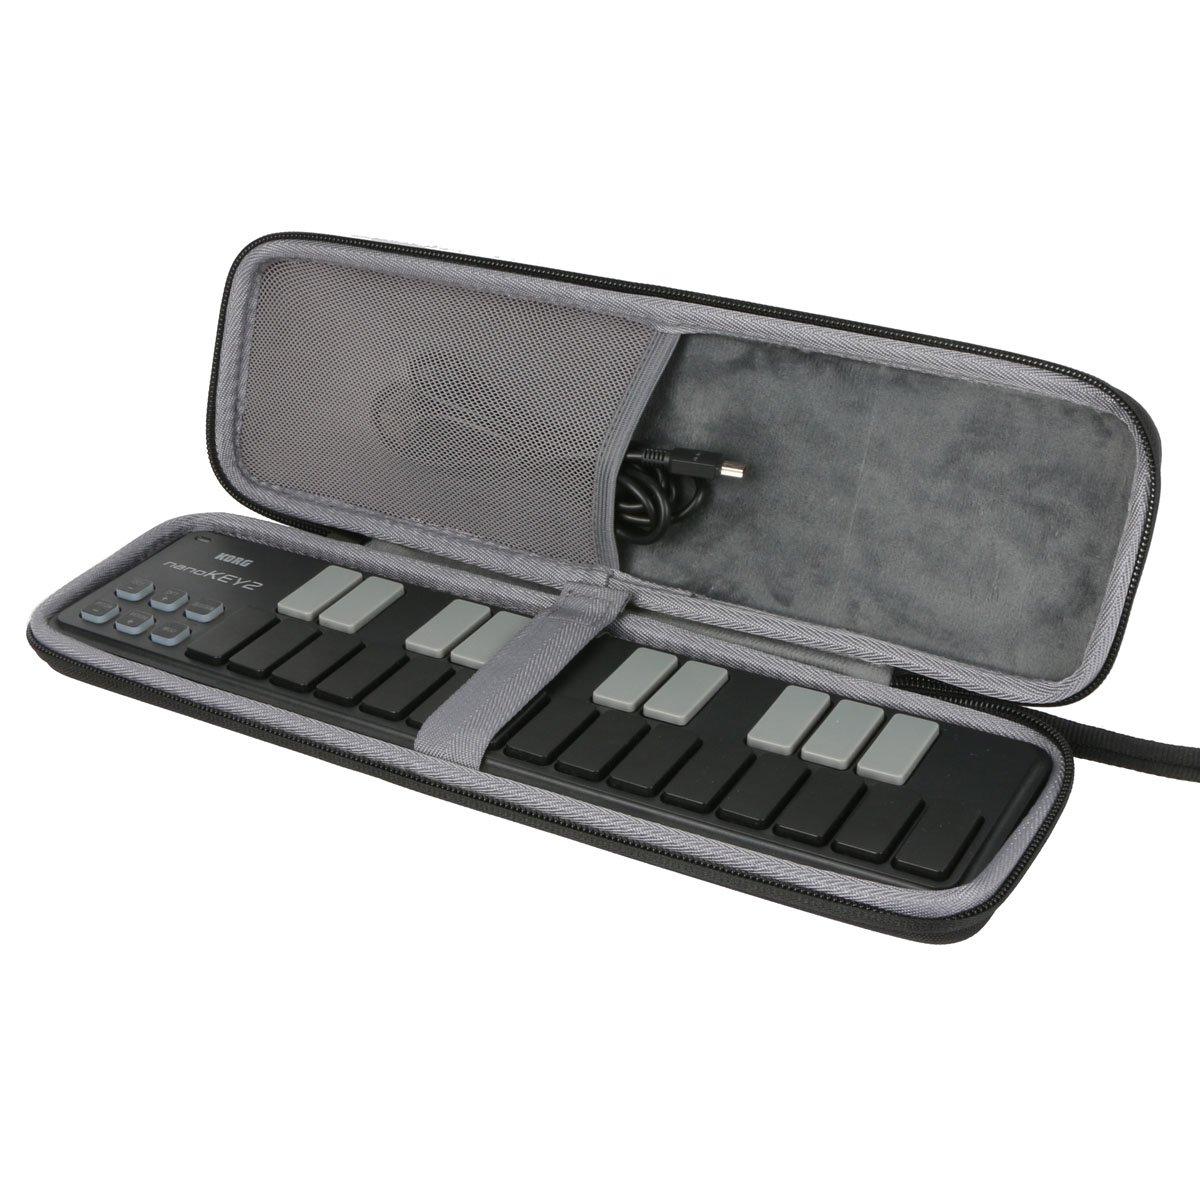 co2CREA Hard Travel Case for nanoKEY2 / nanoPAD2 / nanoKONTROL2 Slimline USB MIDI Controller Keyboard(Case only)